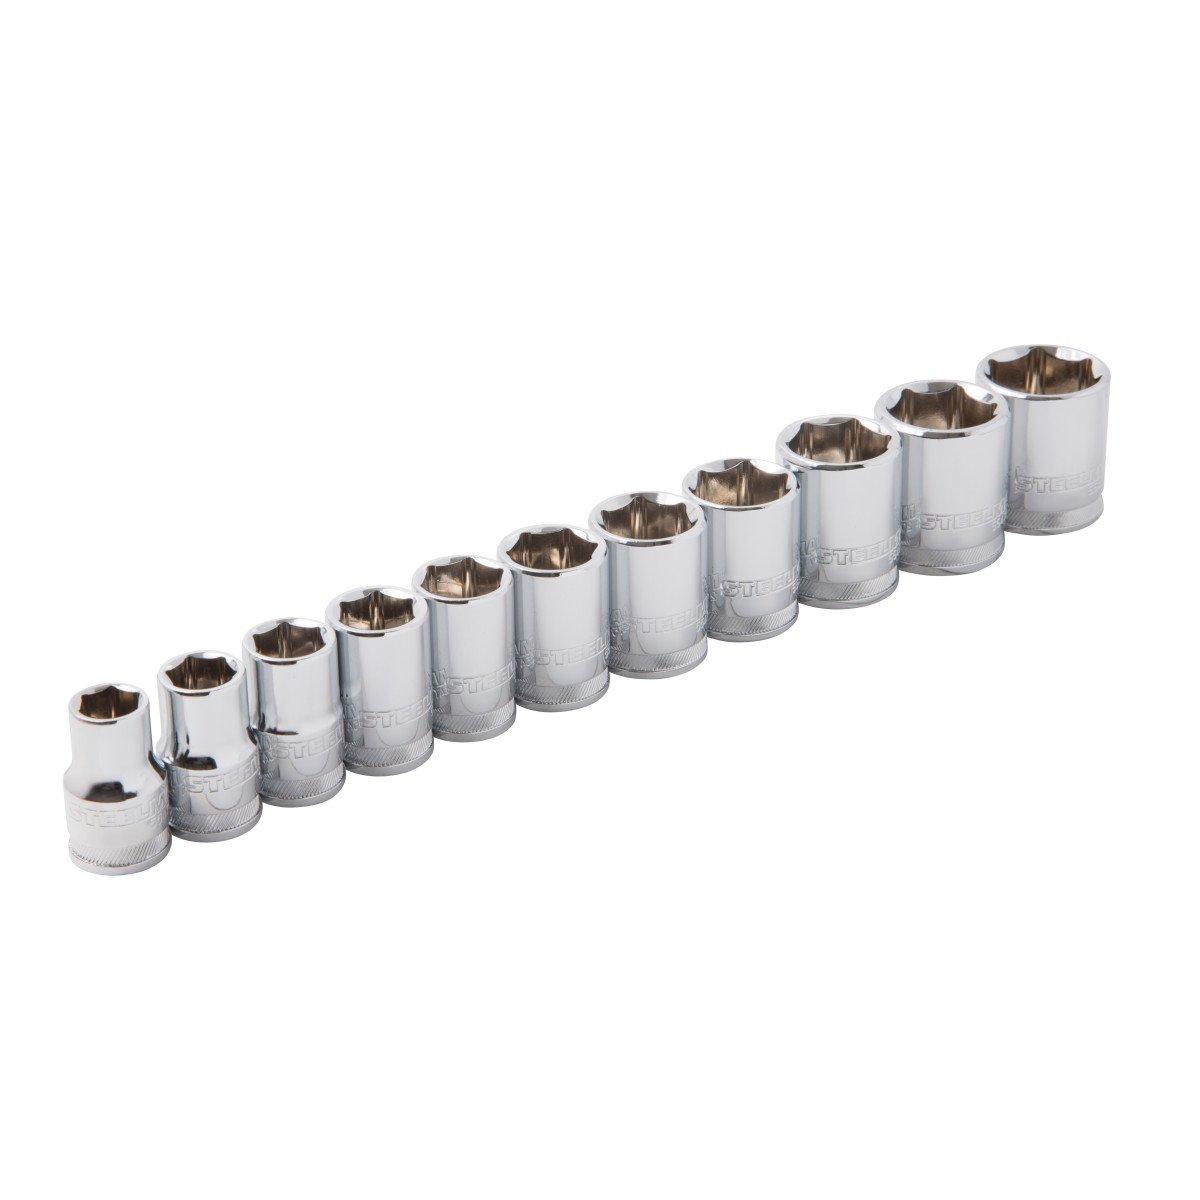 Steelman 55469 11-Piece 3/8-Inch Drive Metric 6-Point Chrome Socket Set